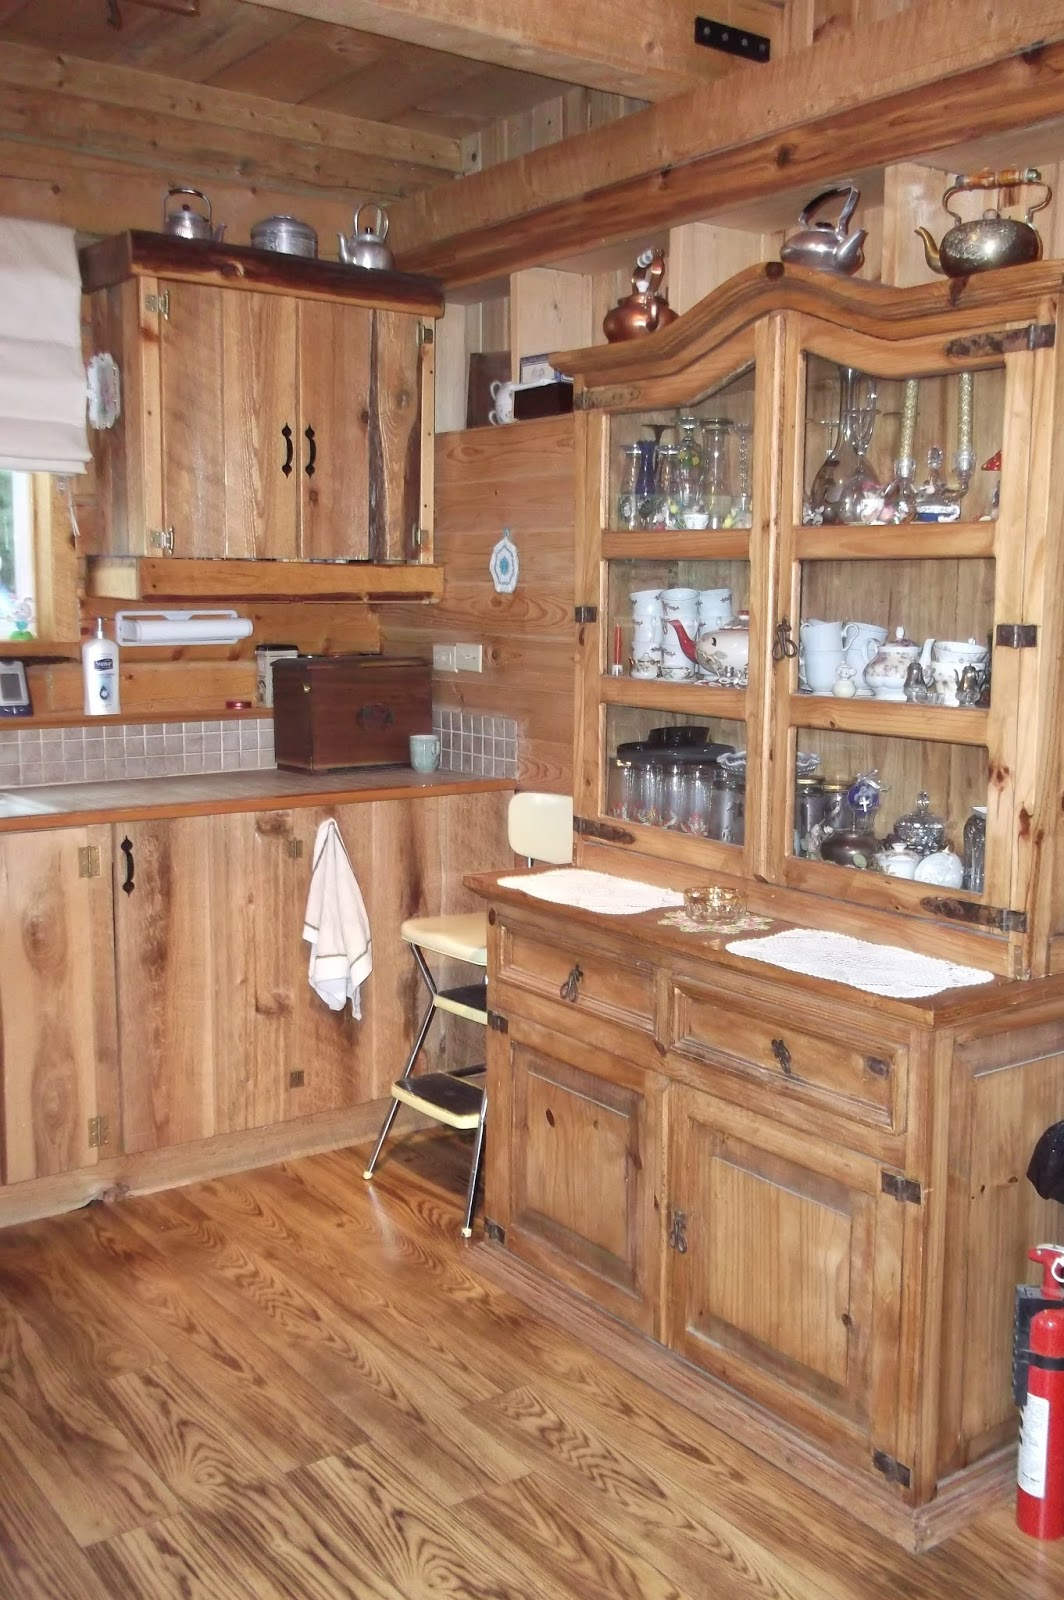 West pine creations kitchen for Kitchen creations